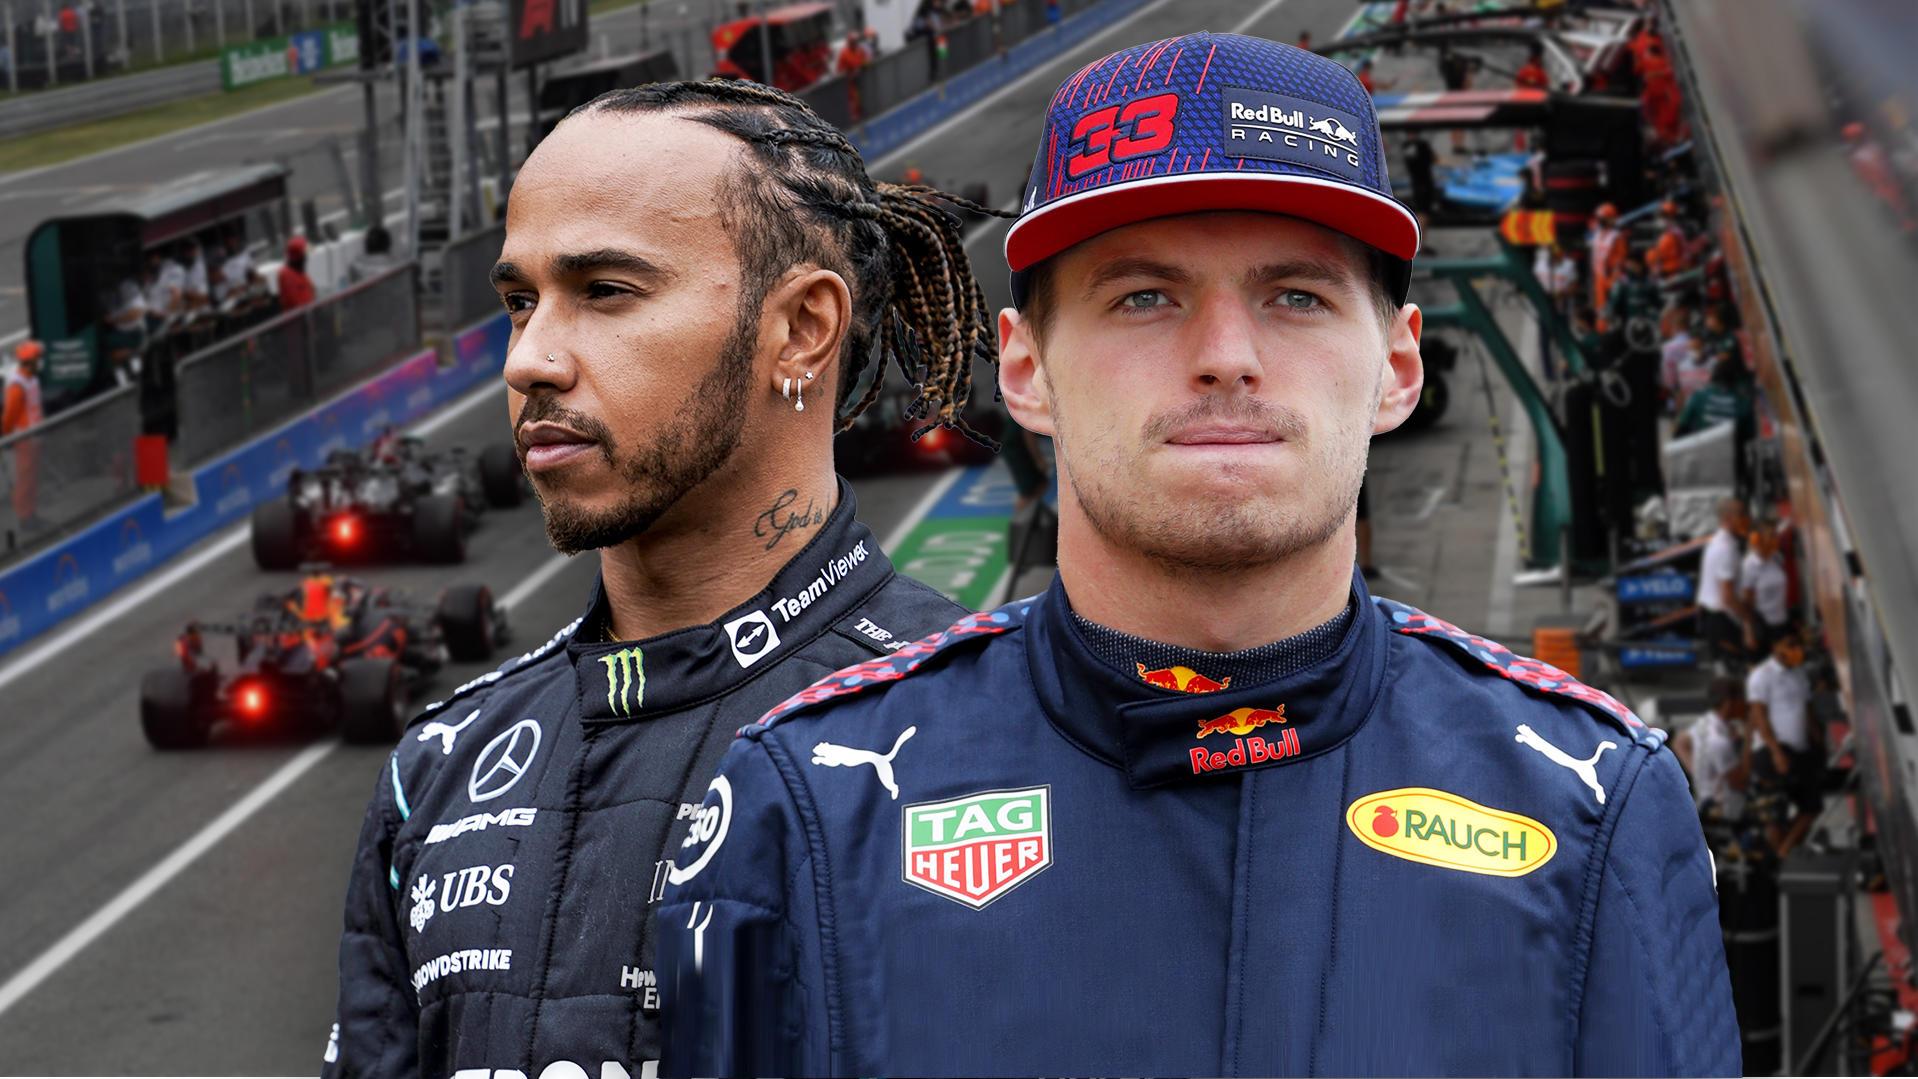 Formel 1 - Knallharter Titelkampf: Lewis Hamilton oder Max Verstappen? Darum geht der Weltmeistertitel 2021 an ...